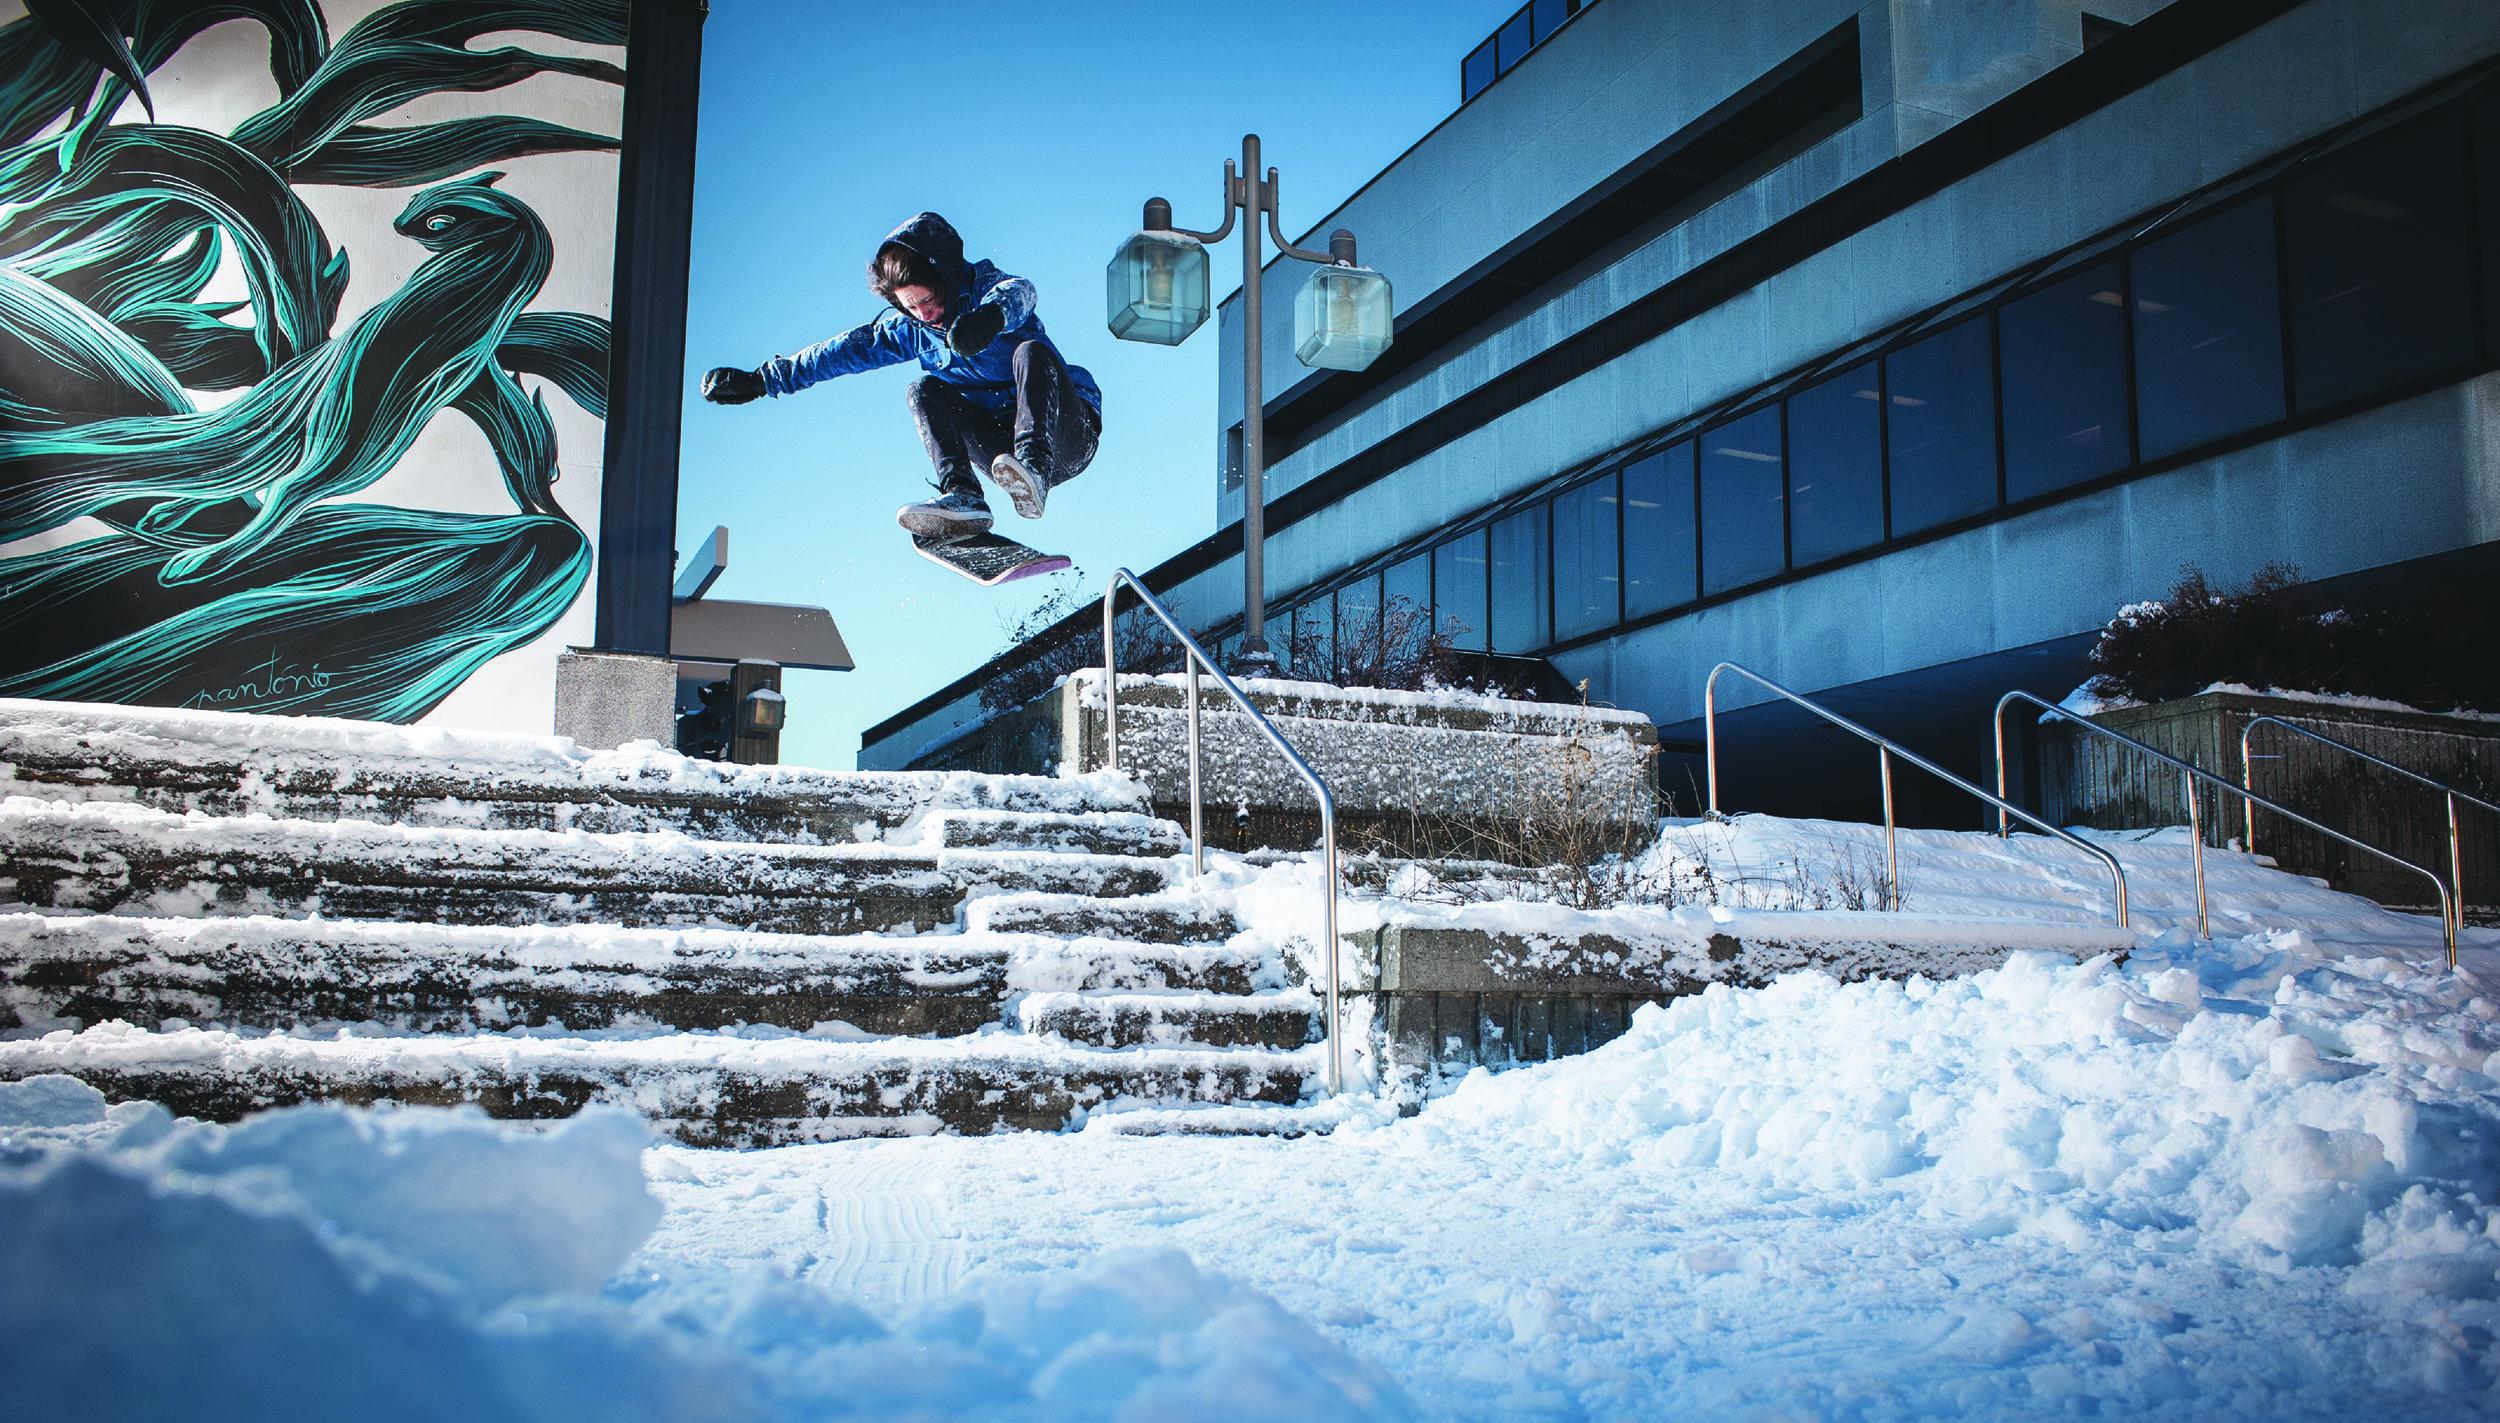 Snowskate Moreau Kickflip